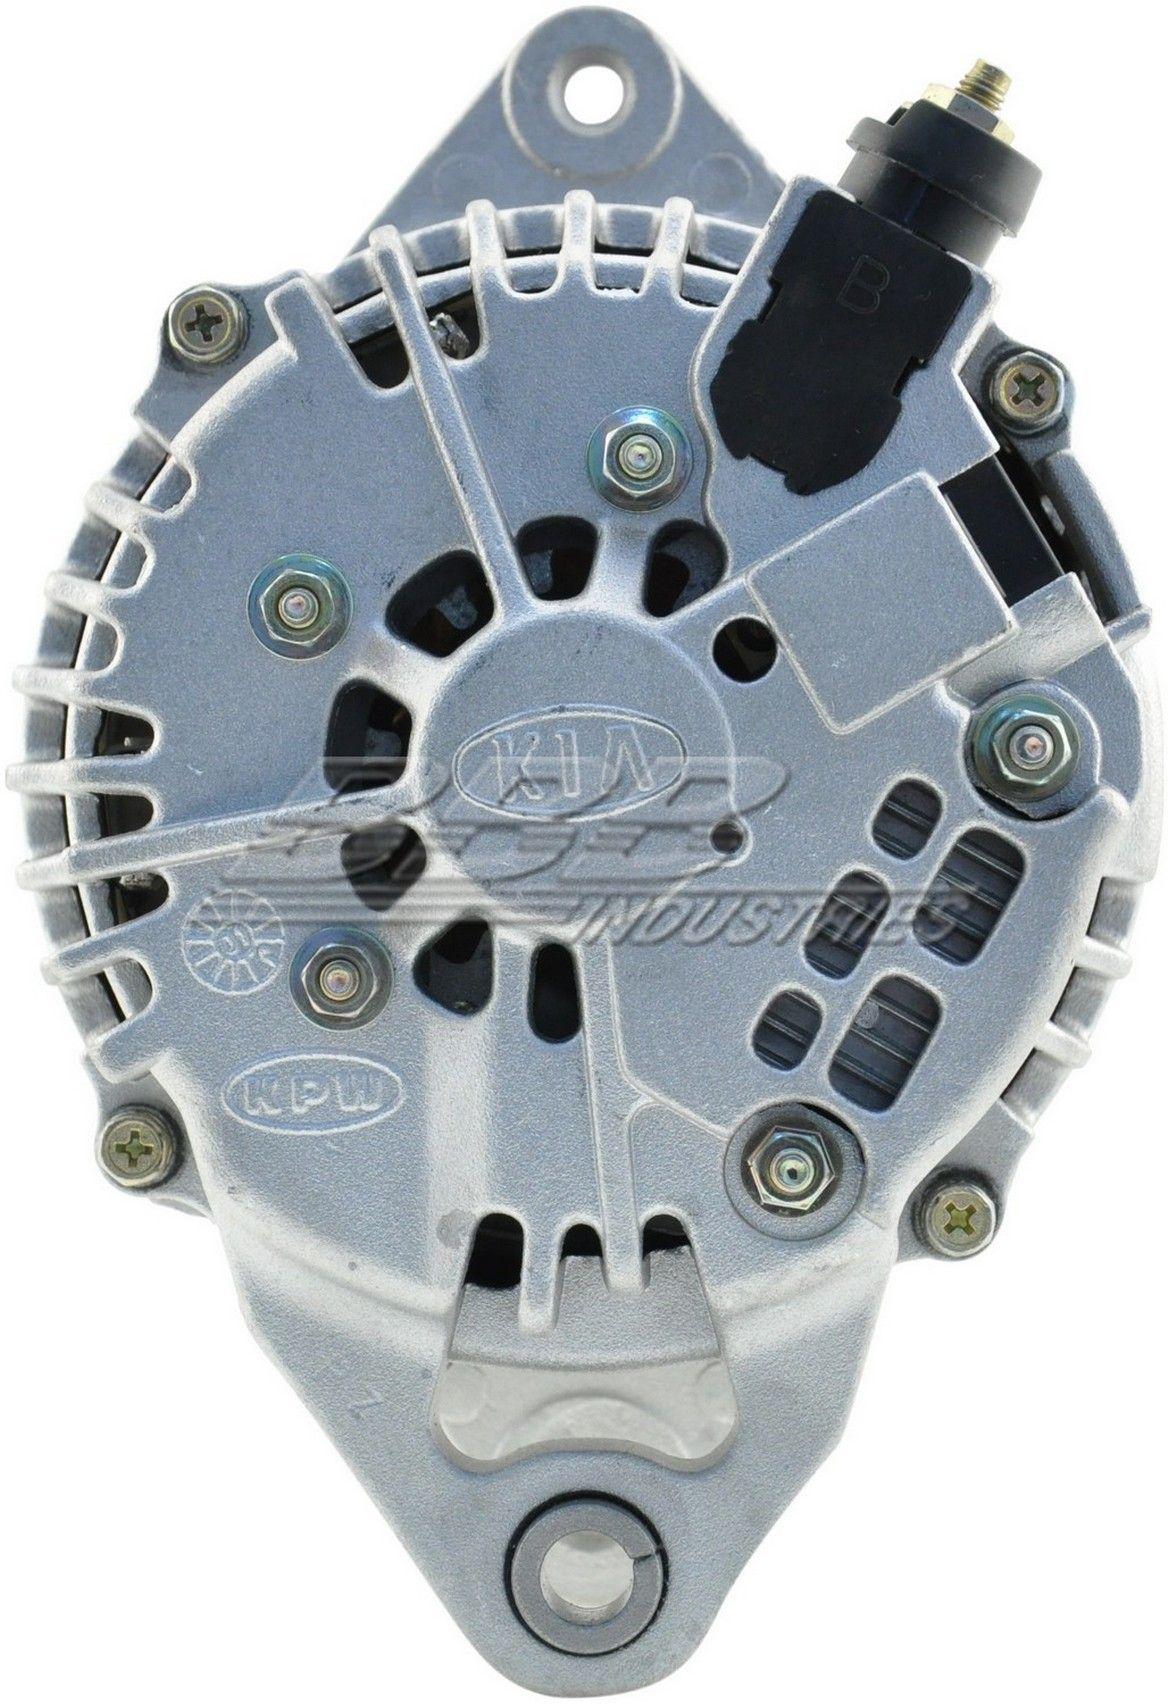 2002 Kia Rio Alternator 4 Cyl 1 5l Bbb Industries 13936 Unit 80 Amps